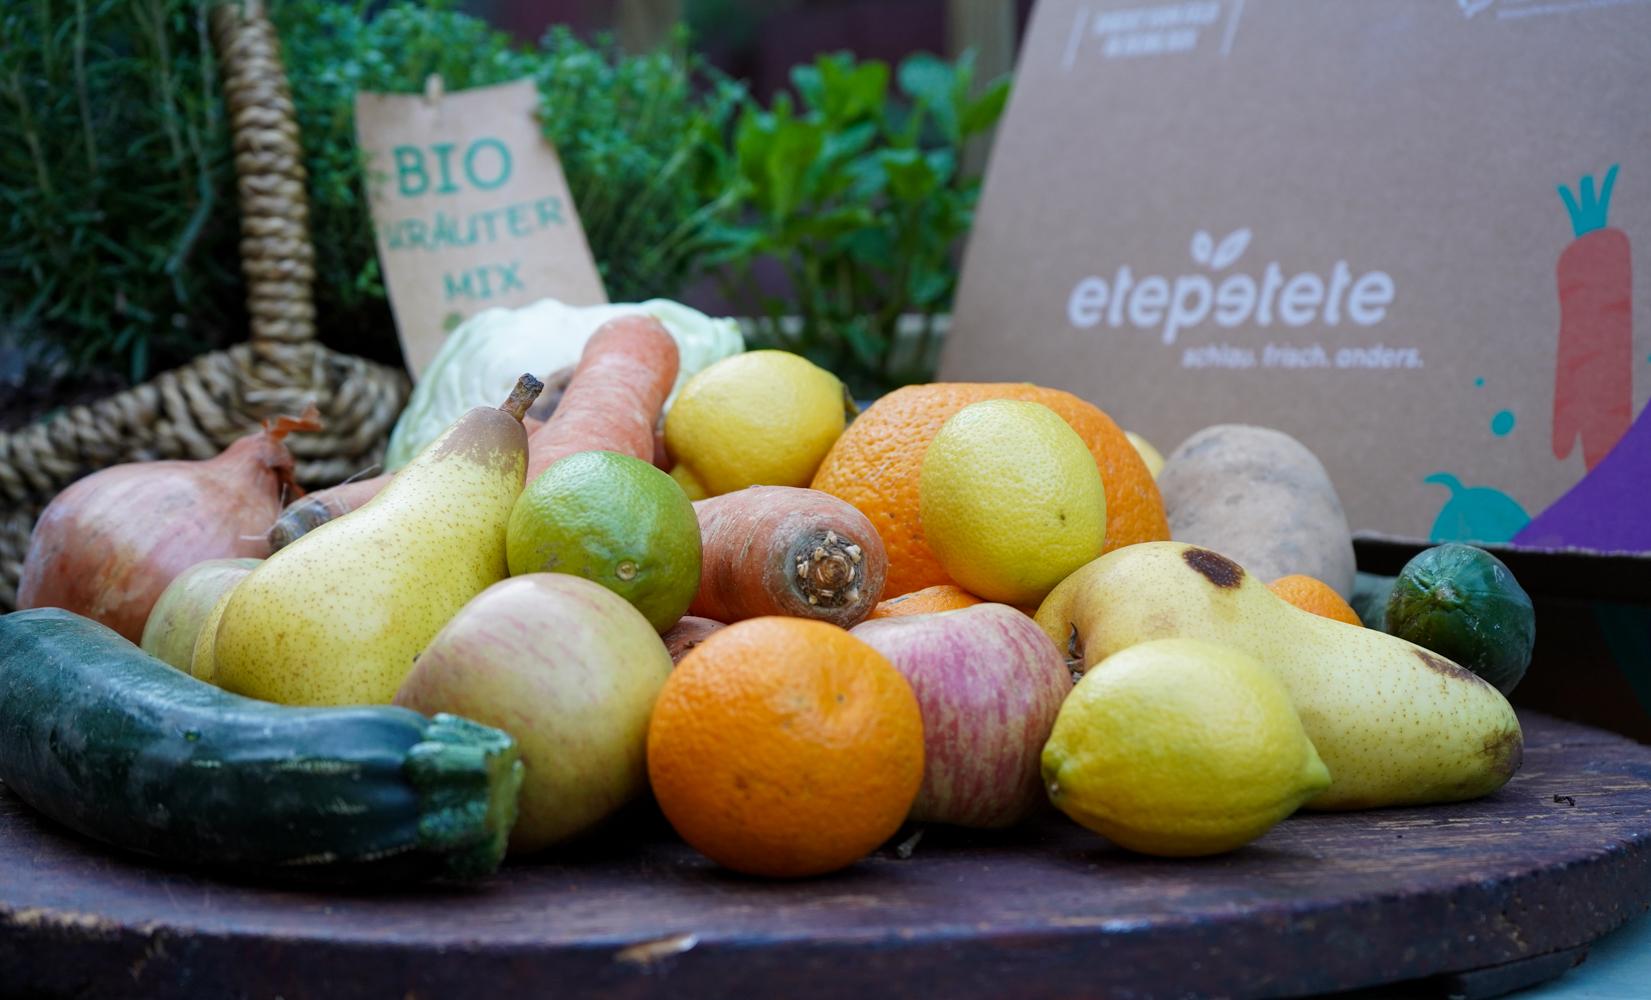 etepetete Gemüsbox